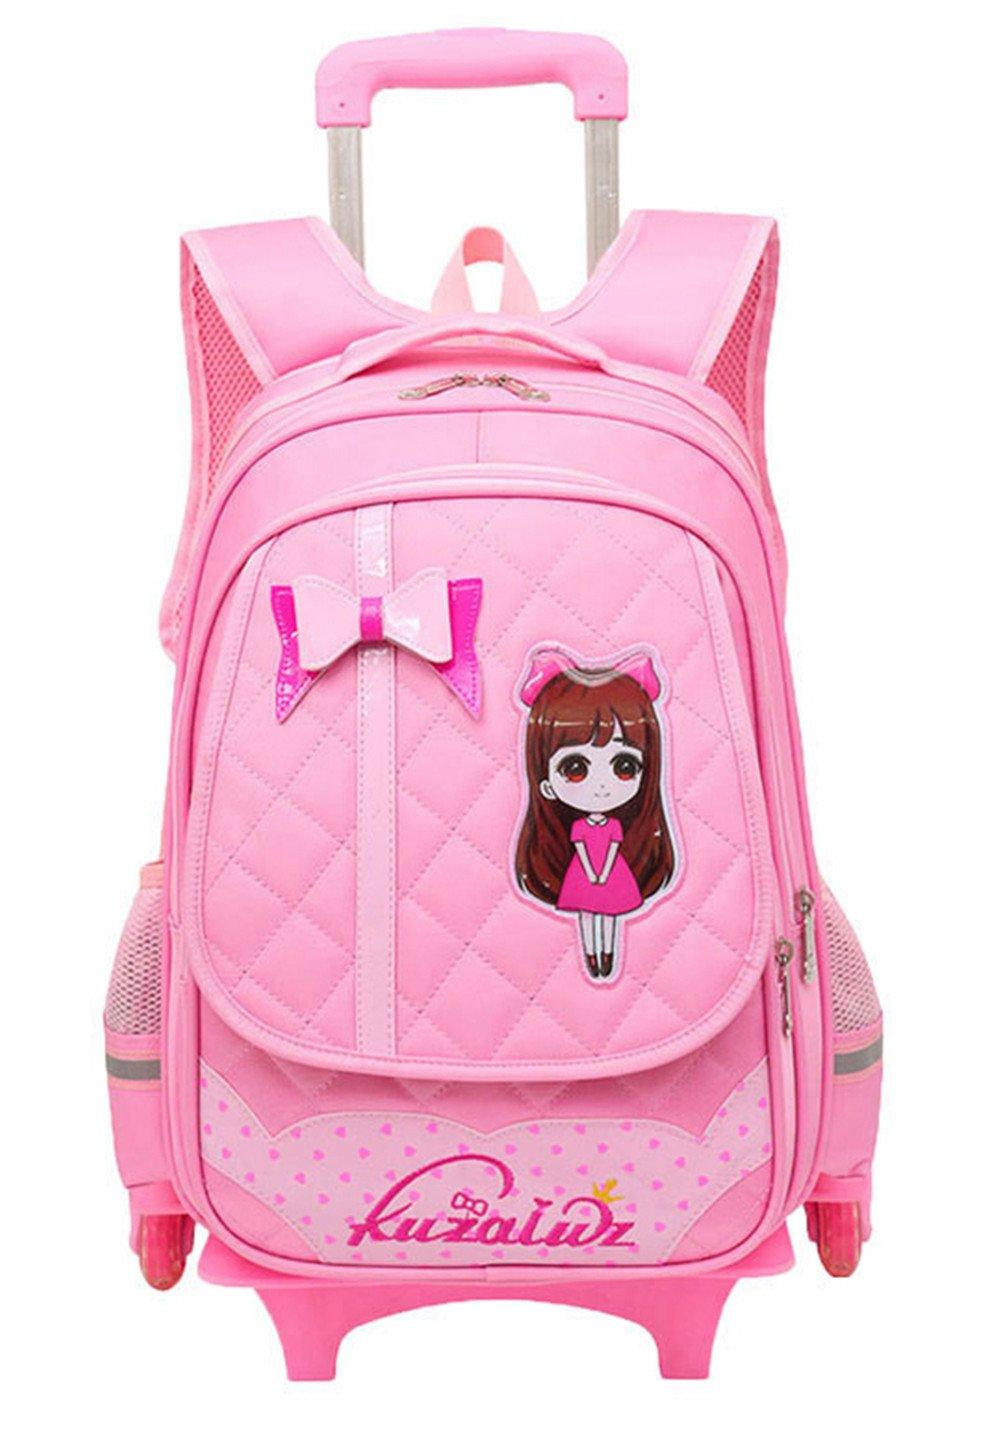 9c3cc9132e Fanci Cute Bowknot Waterproof Rolling School Bag Backpack on Wheels  Princess Style Trolley Wheeled Backpack Carry ...